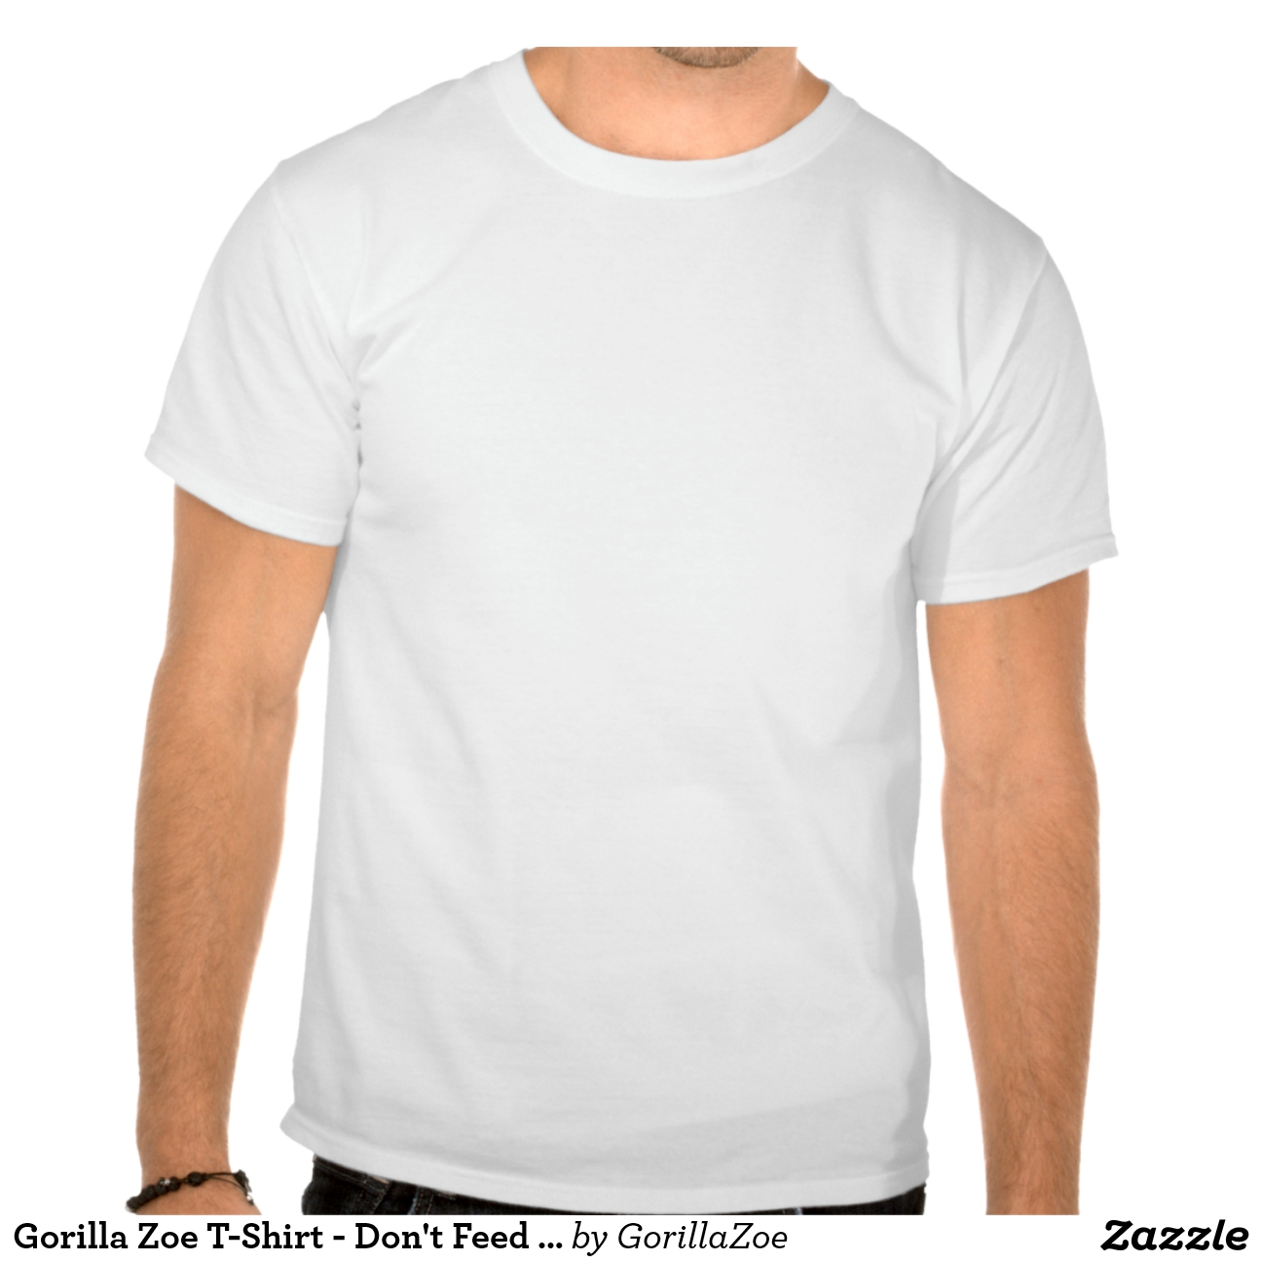 Gorilla Zoe T-Shirt - Don't Feed Da Animals   Zazzle